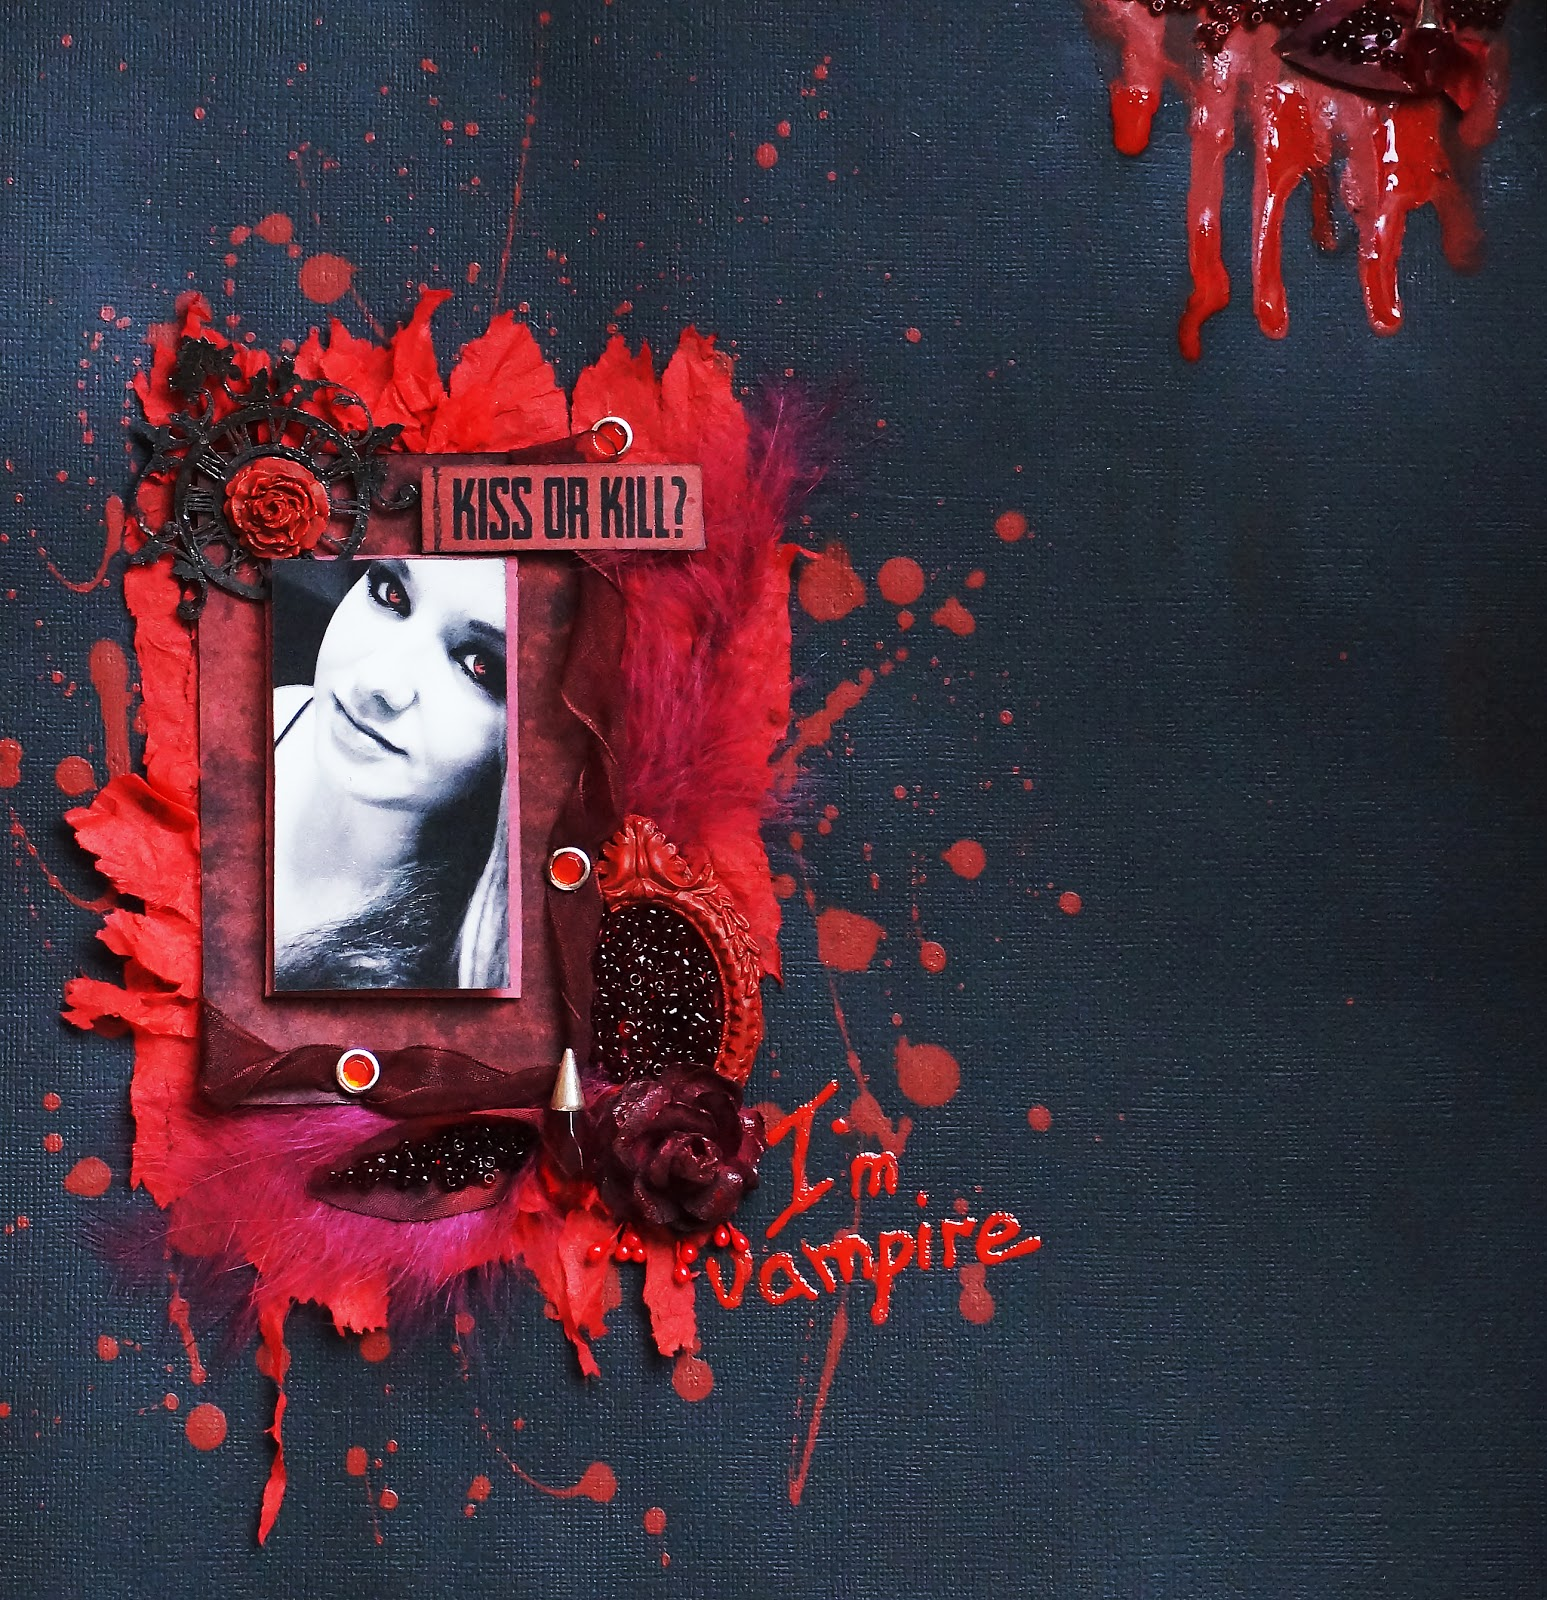 I'm vampire. Страничка для Хэллуина..